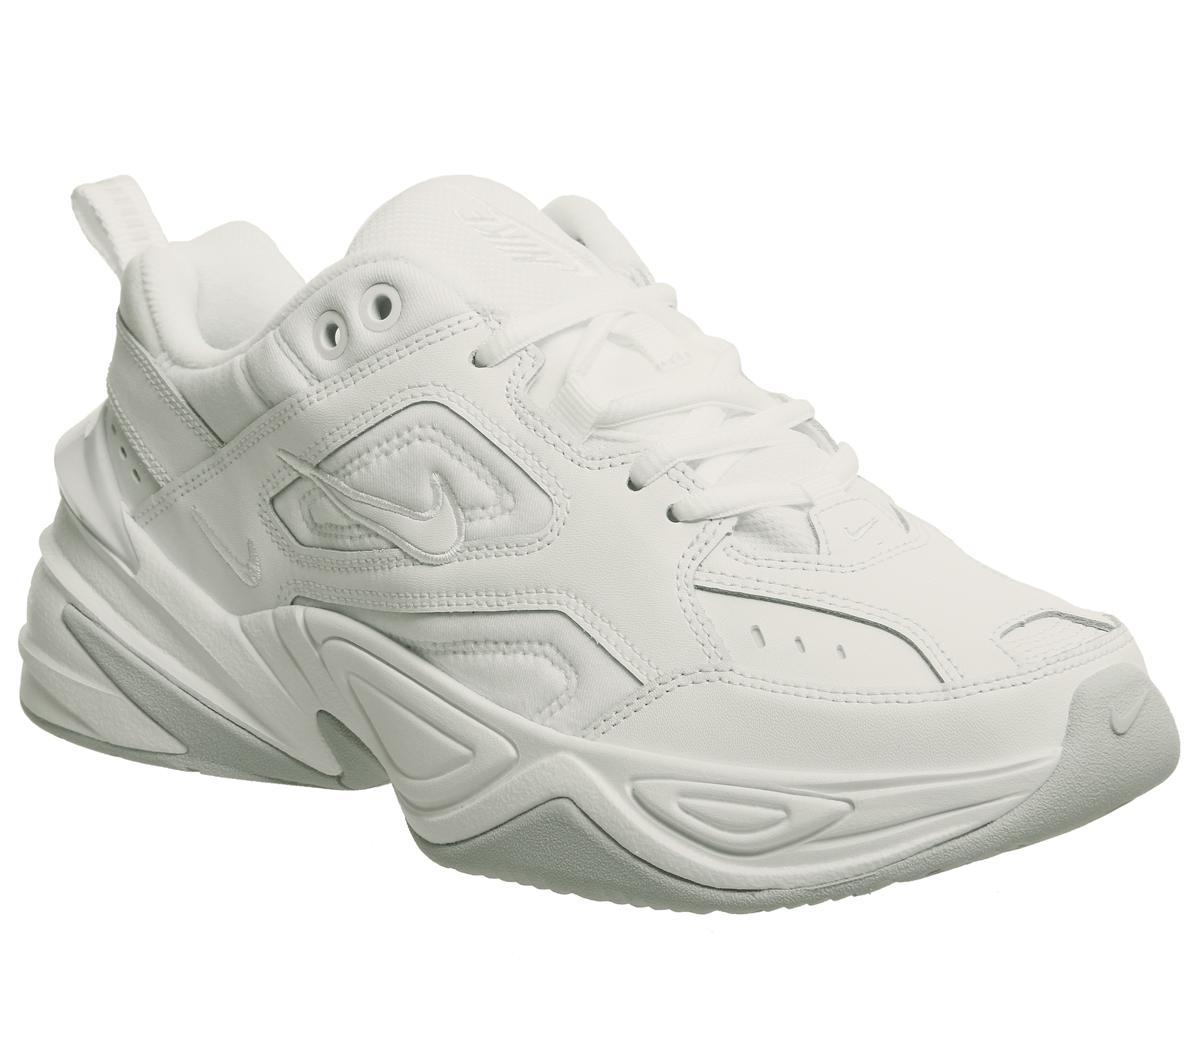 Nike M2k Tekno Trainers White Pure Platinum F Sneaker damen